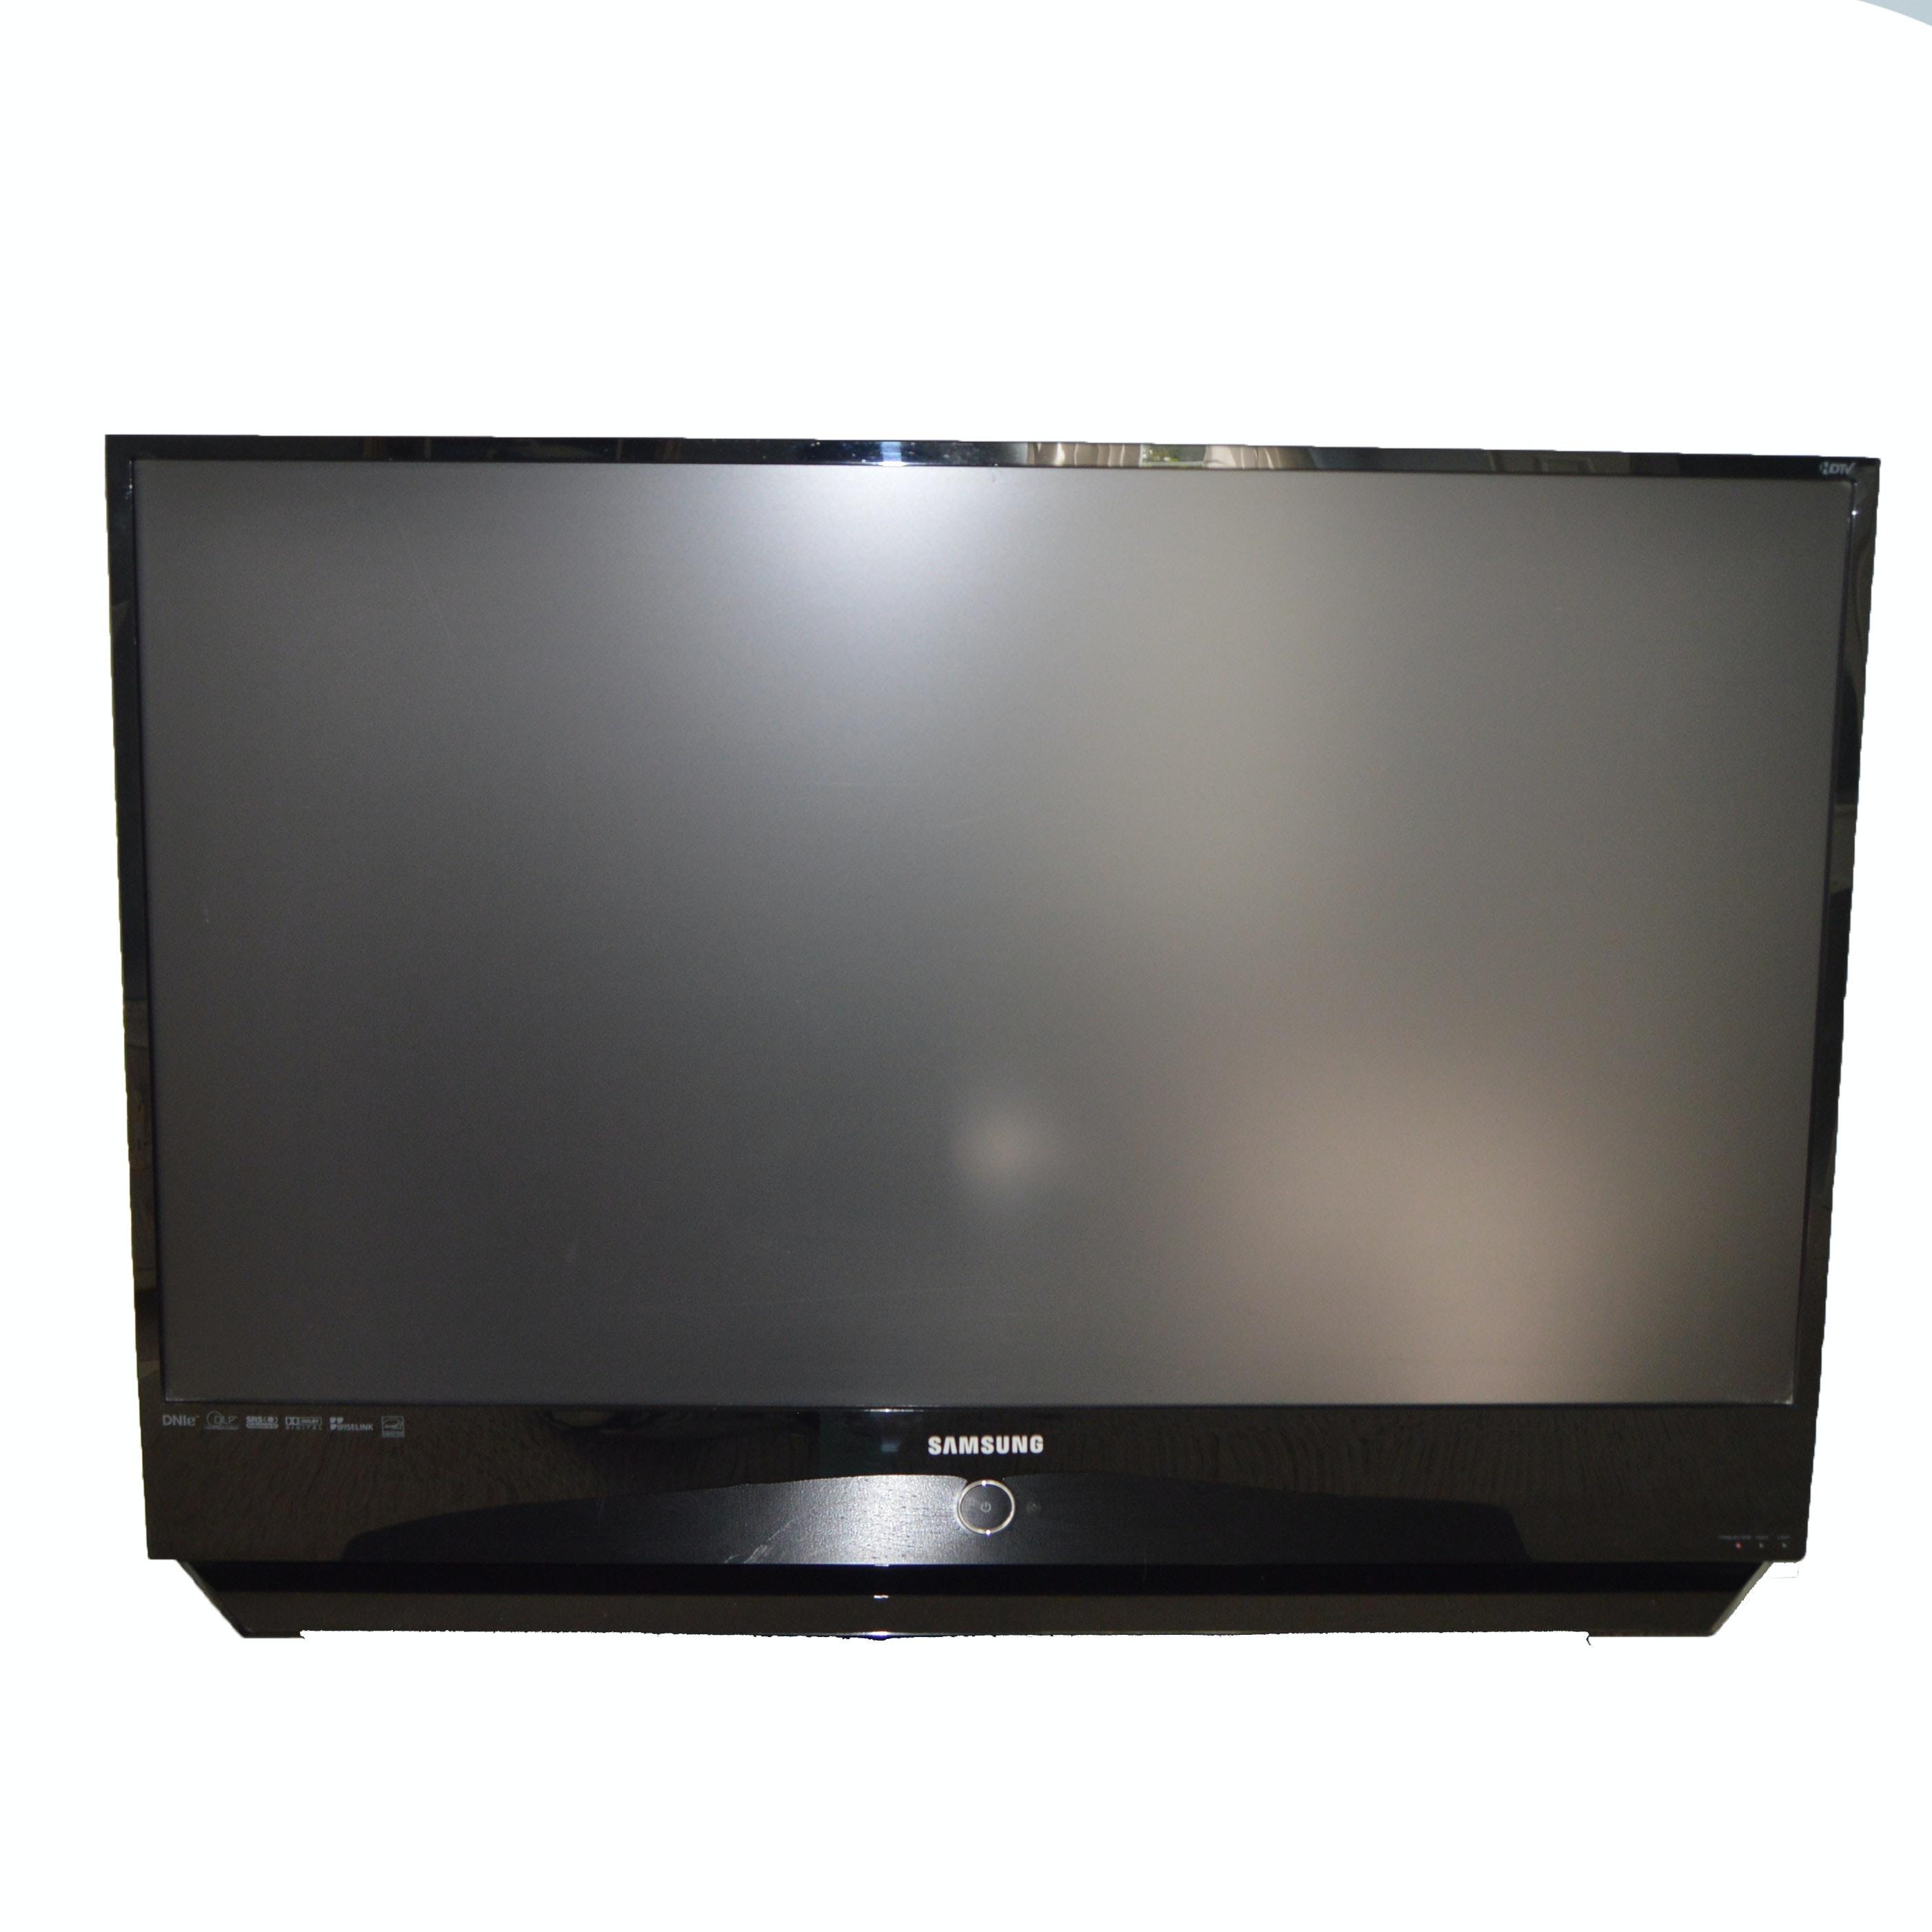 Samsung Flat Screen Television